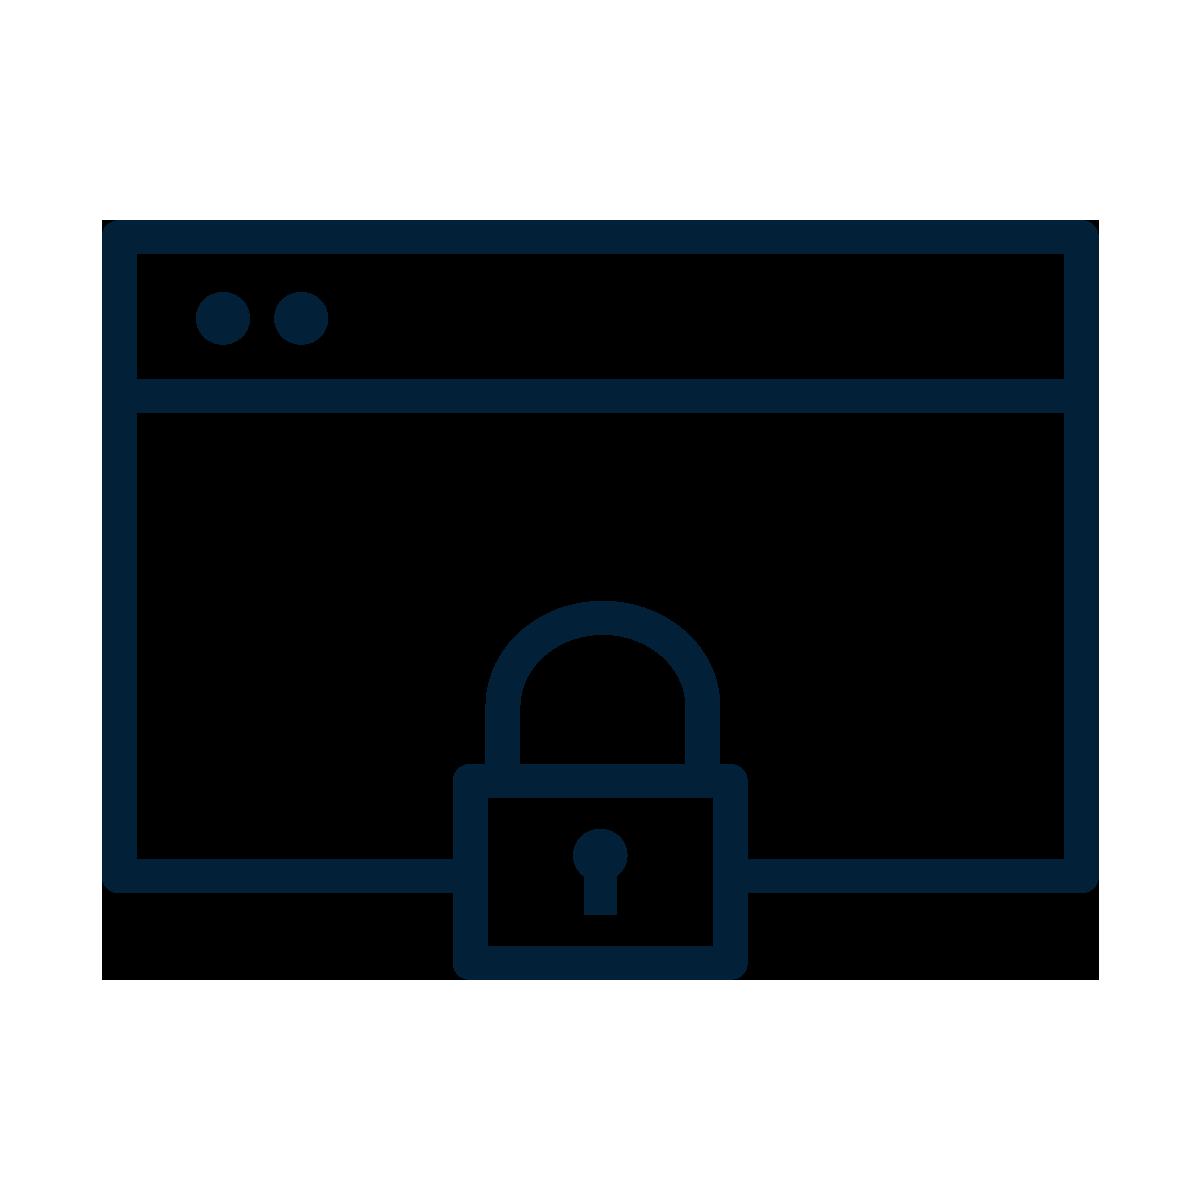 noun_secure_3427766 (1)